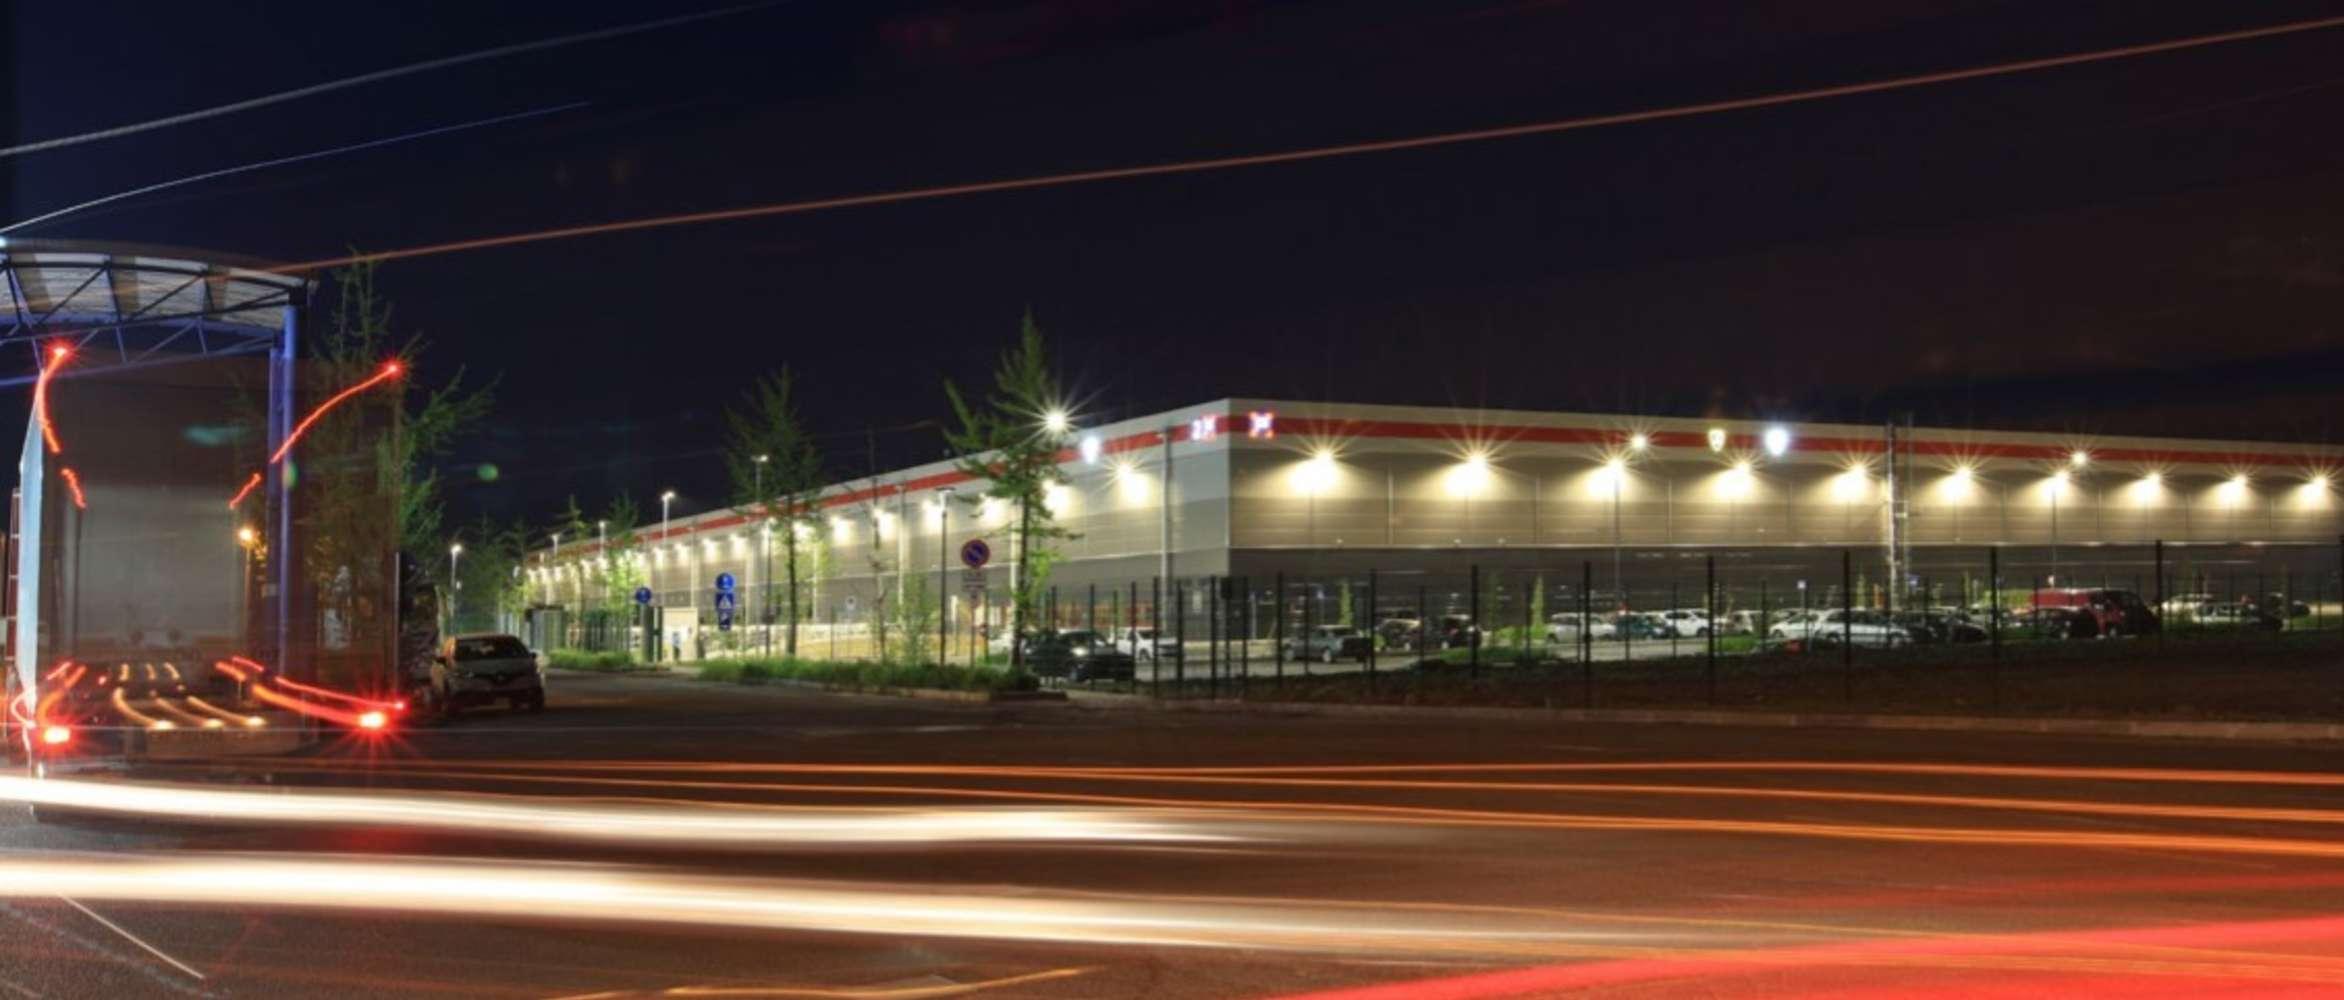 Magazzini industriali e logistici Sala bolognese, 40010 - Sala Bolognese